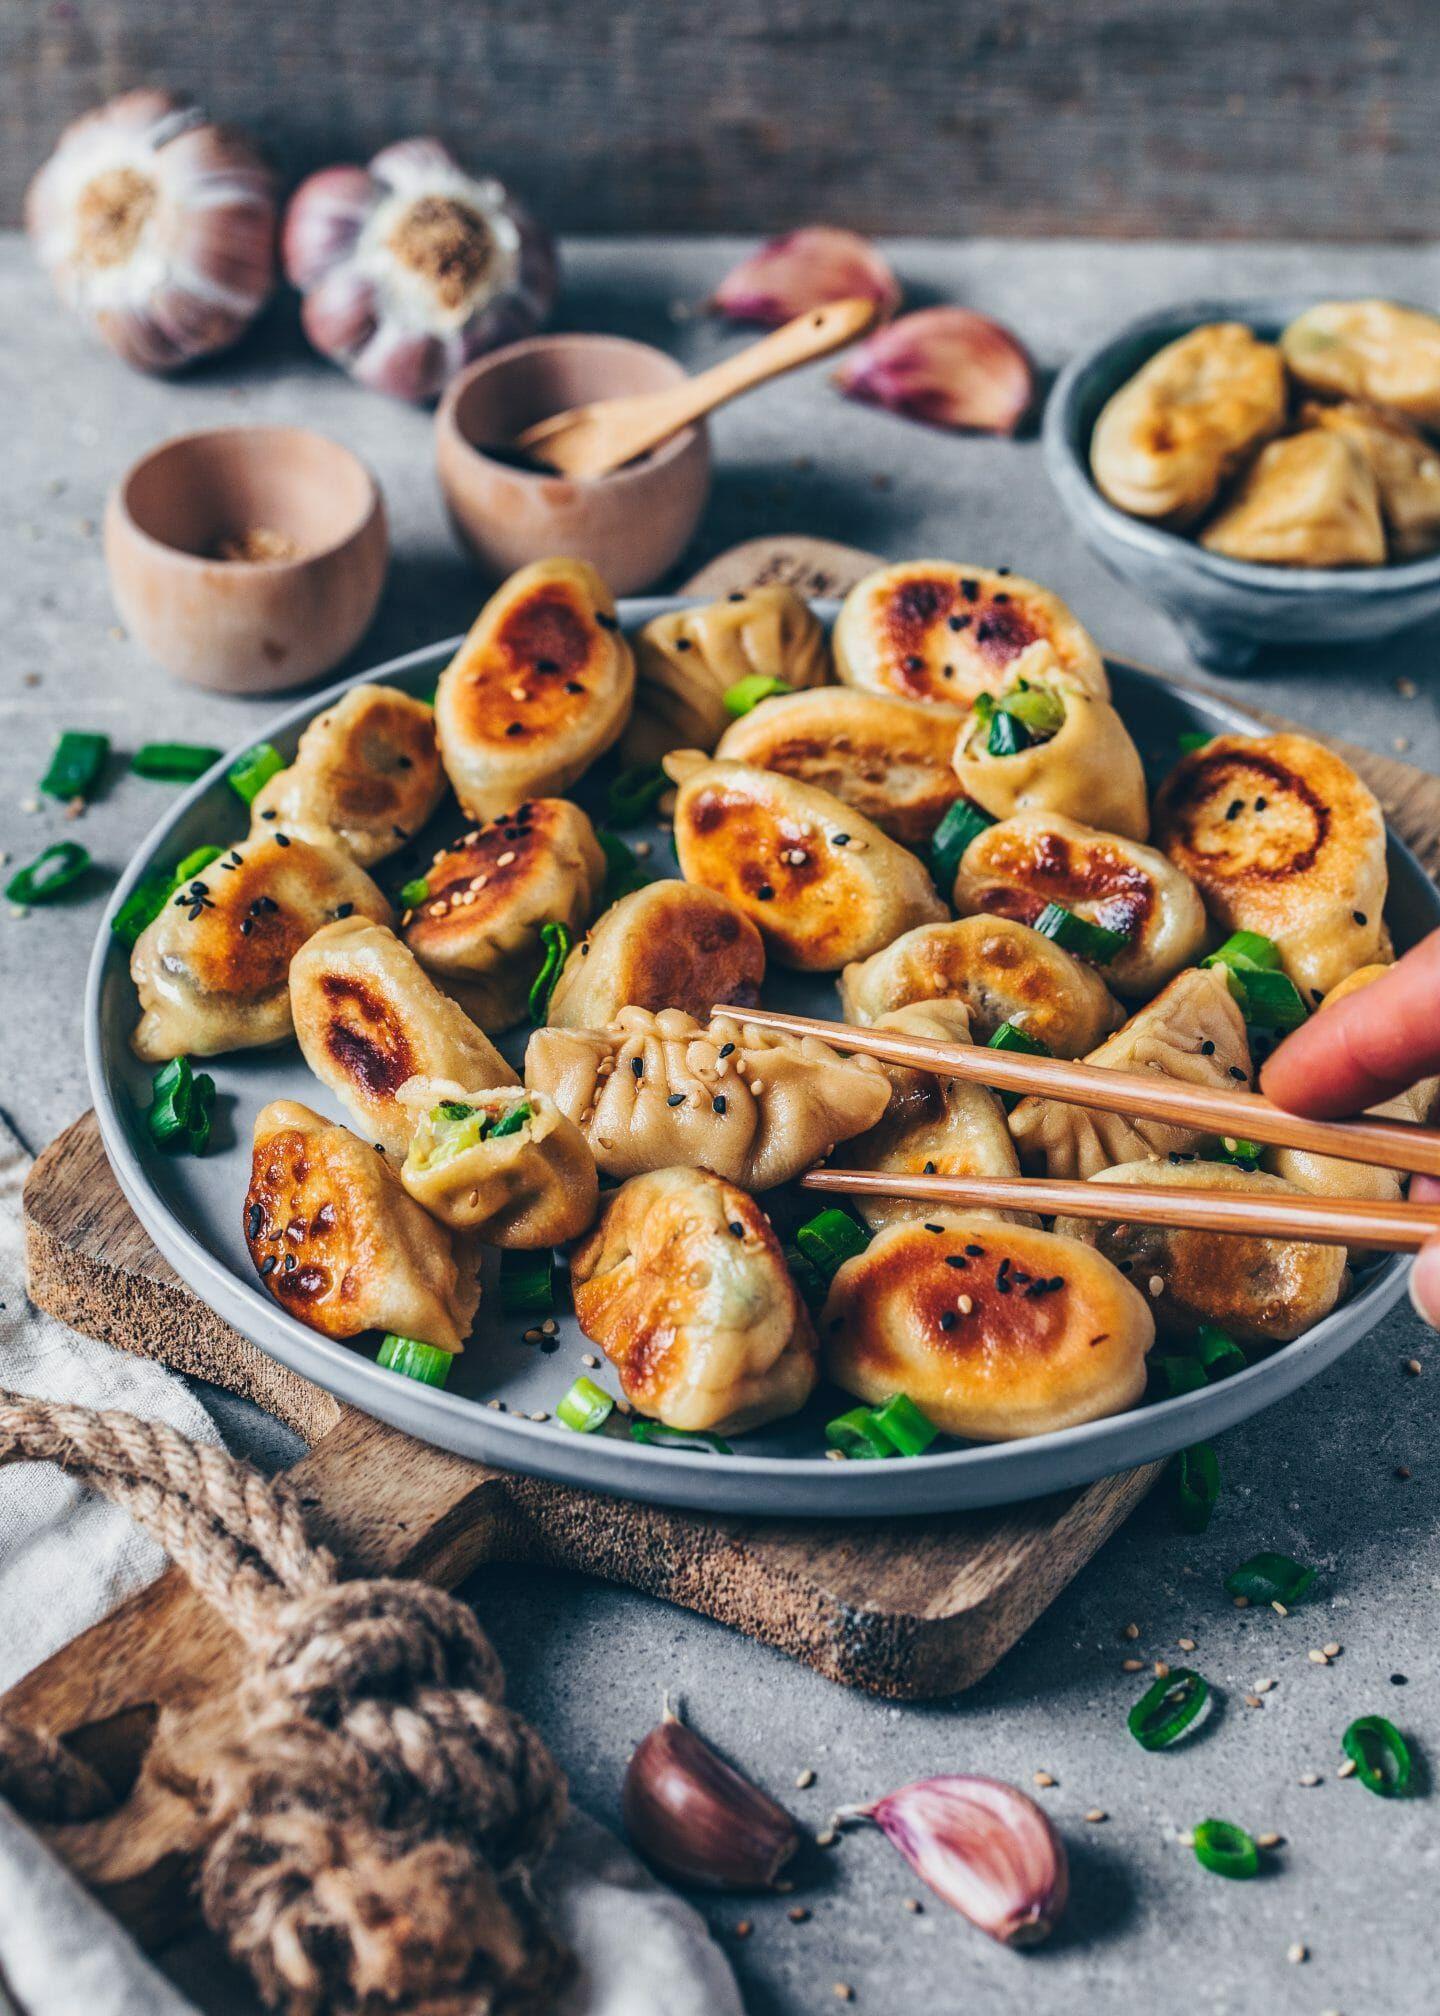 Vegetarian Chinese Dumplings Recipe  Ve able Dumplings Vegan Gyoza Potstickers